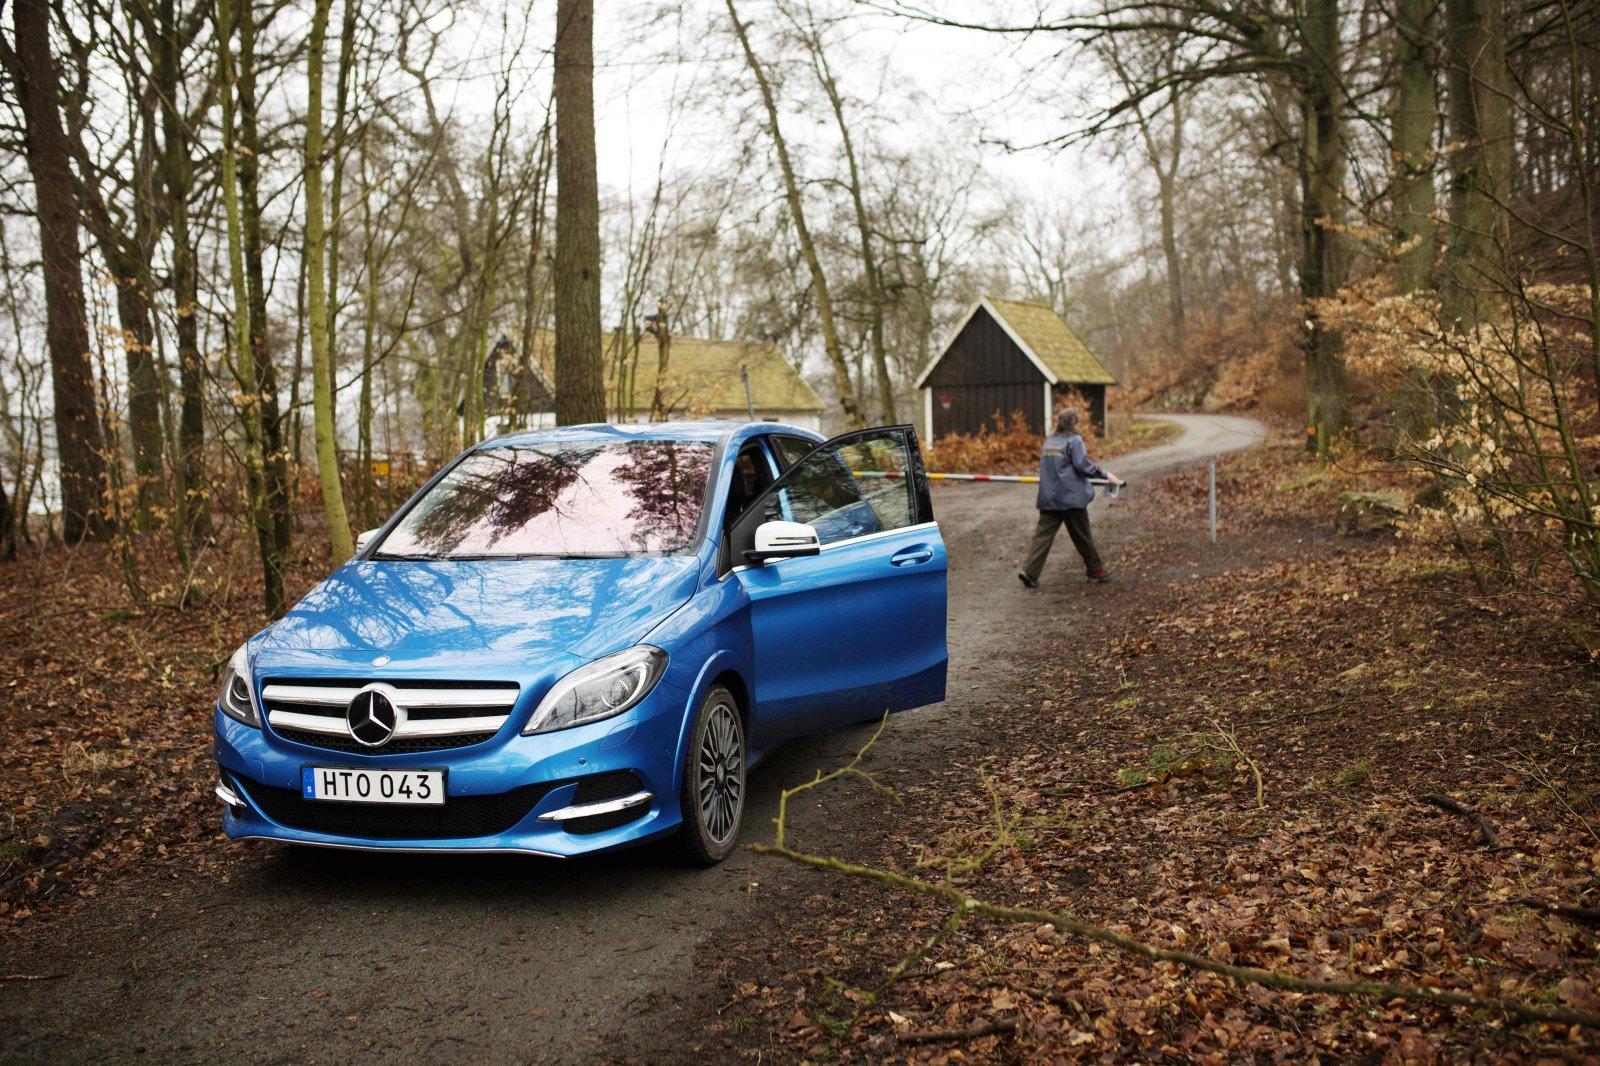 Mercedes B-Klass Electric Drive, elbil, Harriet Andersson, Snogeholms strövområde Foto: Jenny Leyman